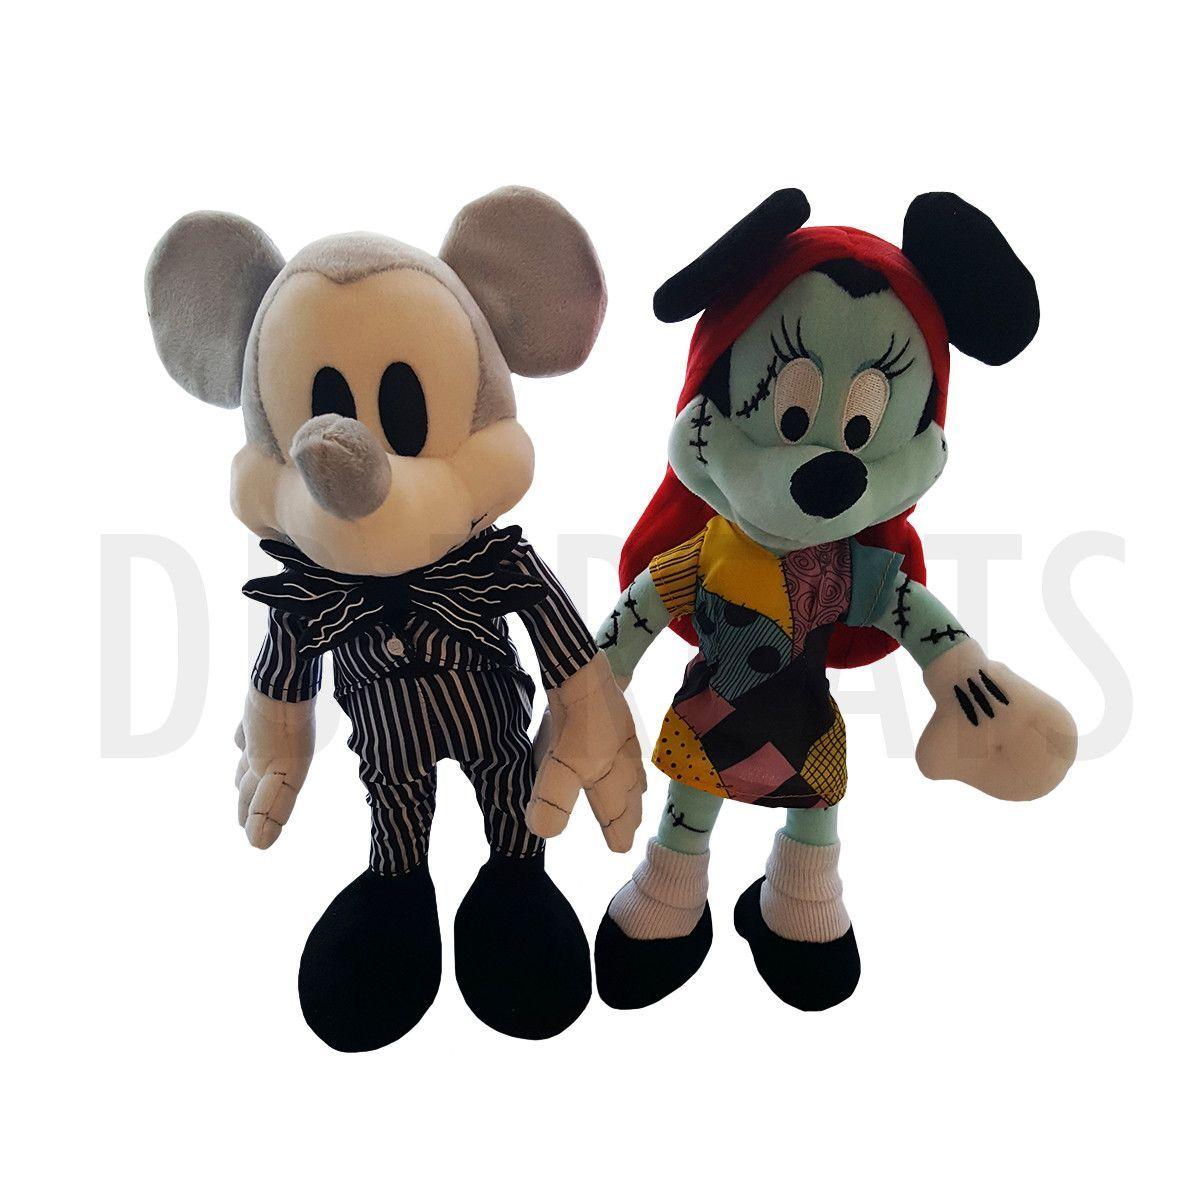 Christmas Minnie Mouse Plush.Pin On Nightmare Before Christmas